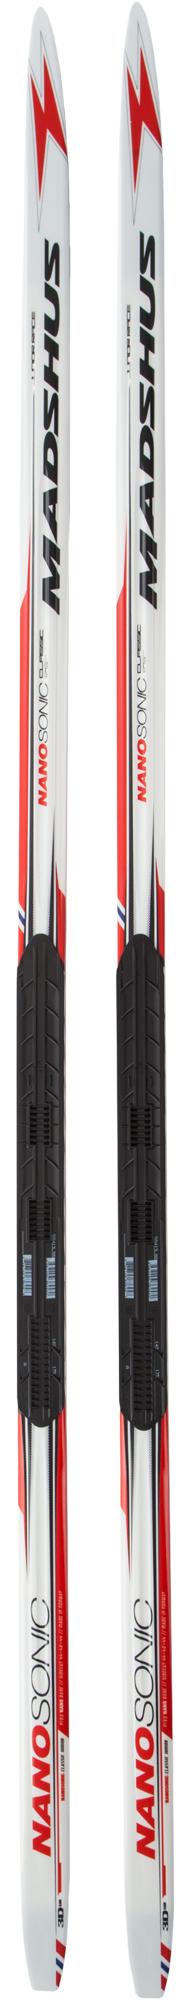 Madshus Беговые лыжи юниорские Madshus Nanosonic Carbon Classic Jr лыжи беговые tisa top classic n90415